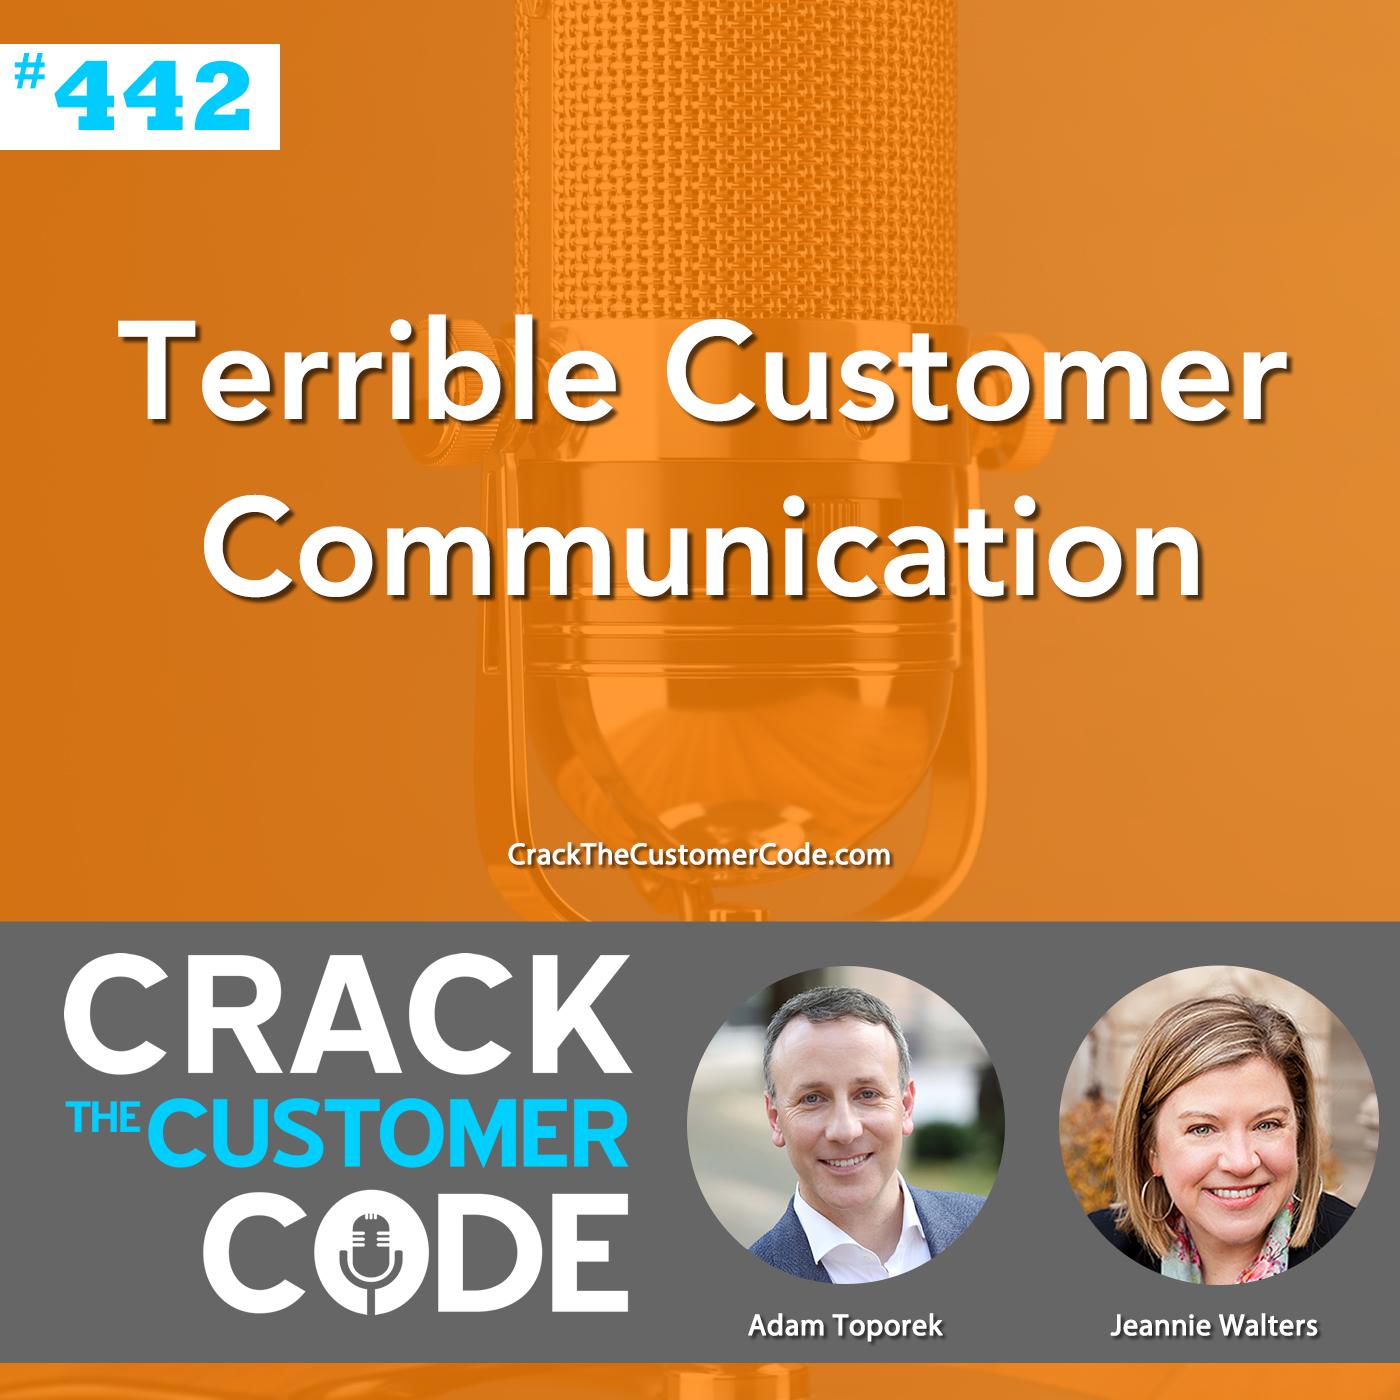 442: Terrible Customer Communication